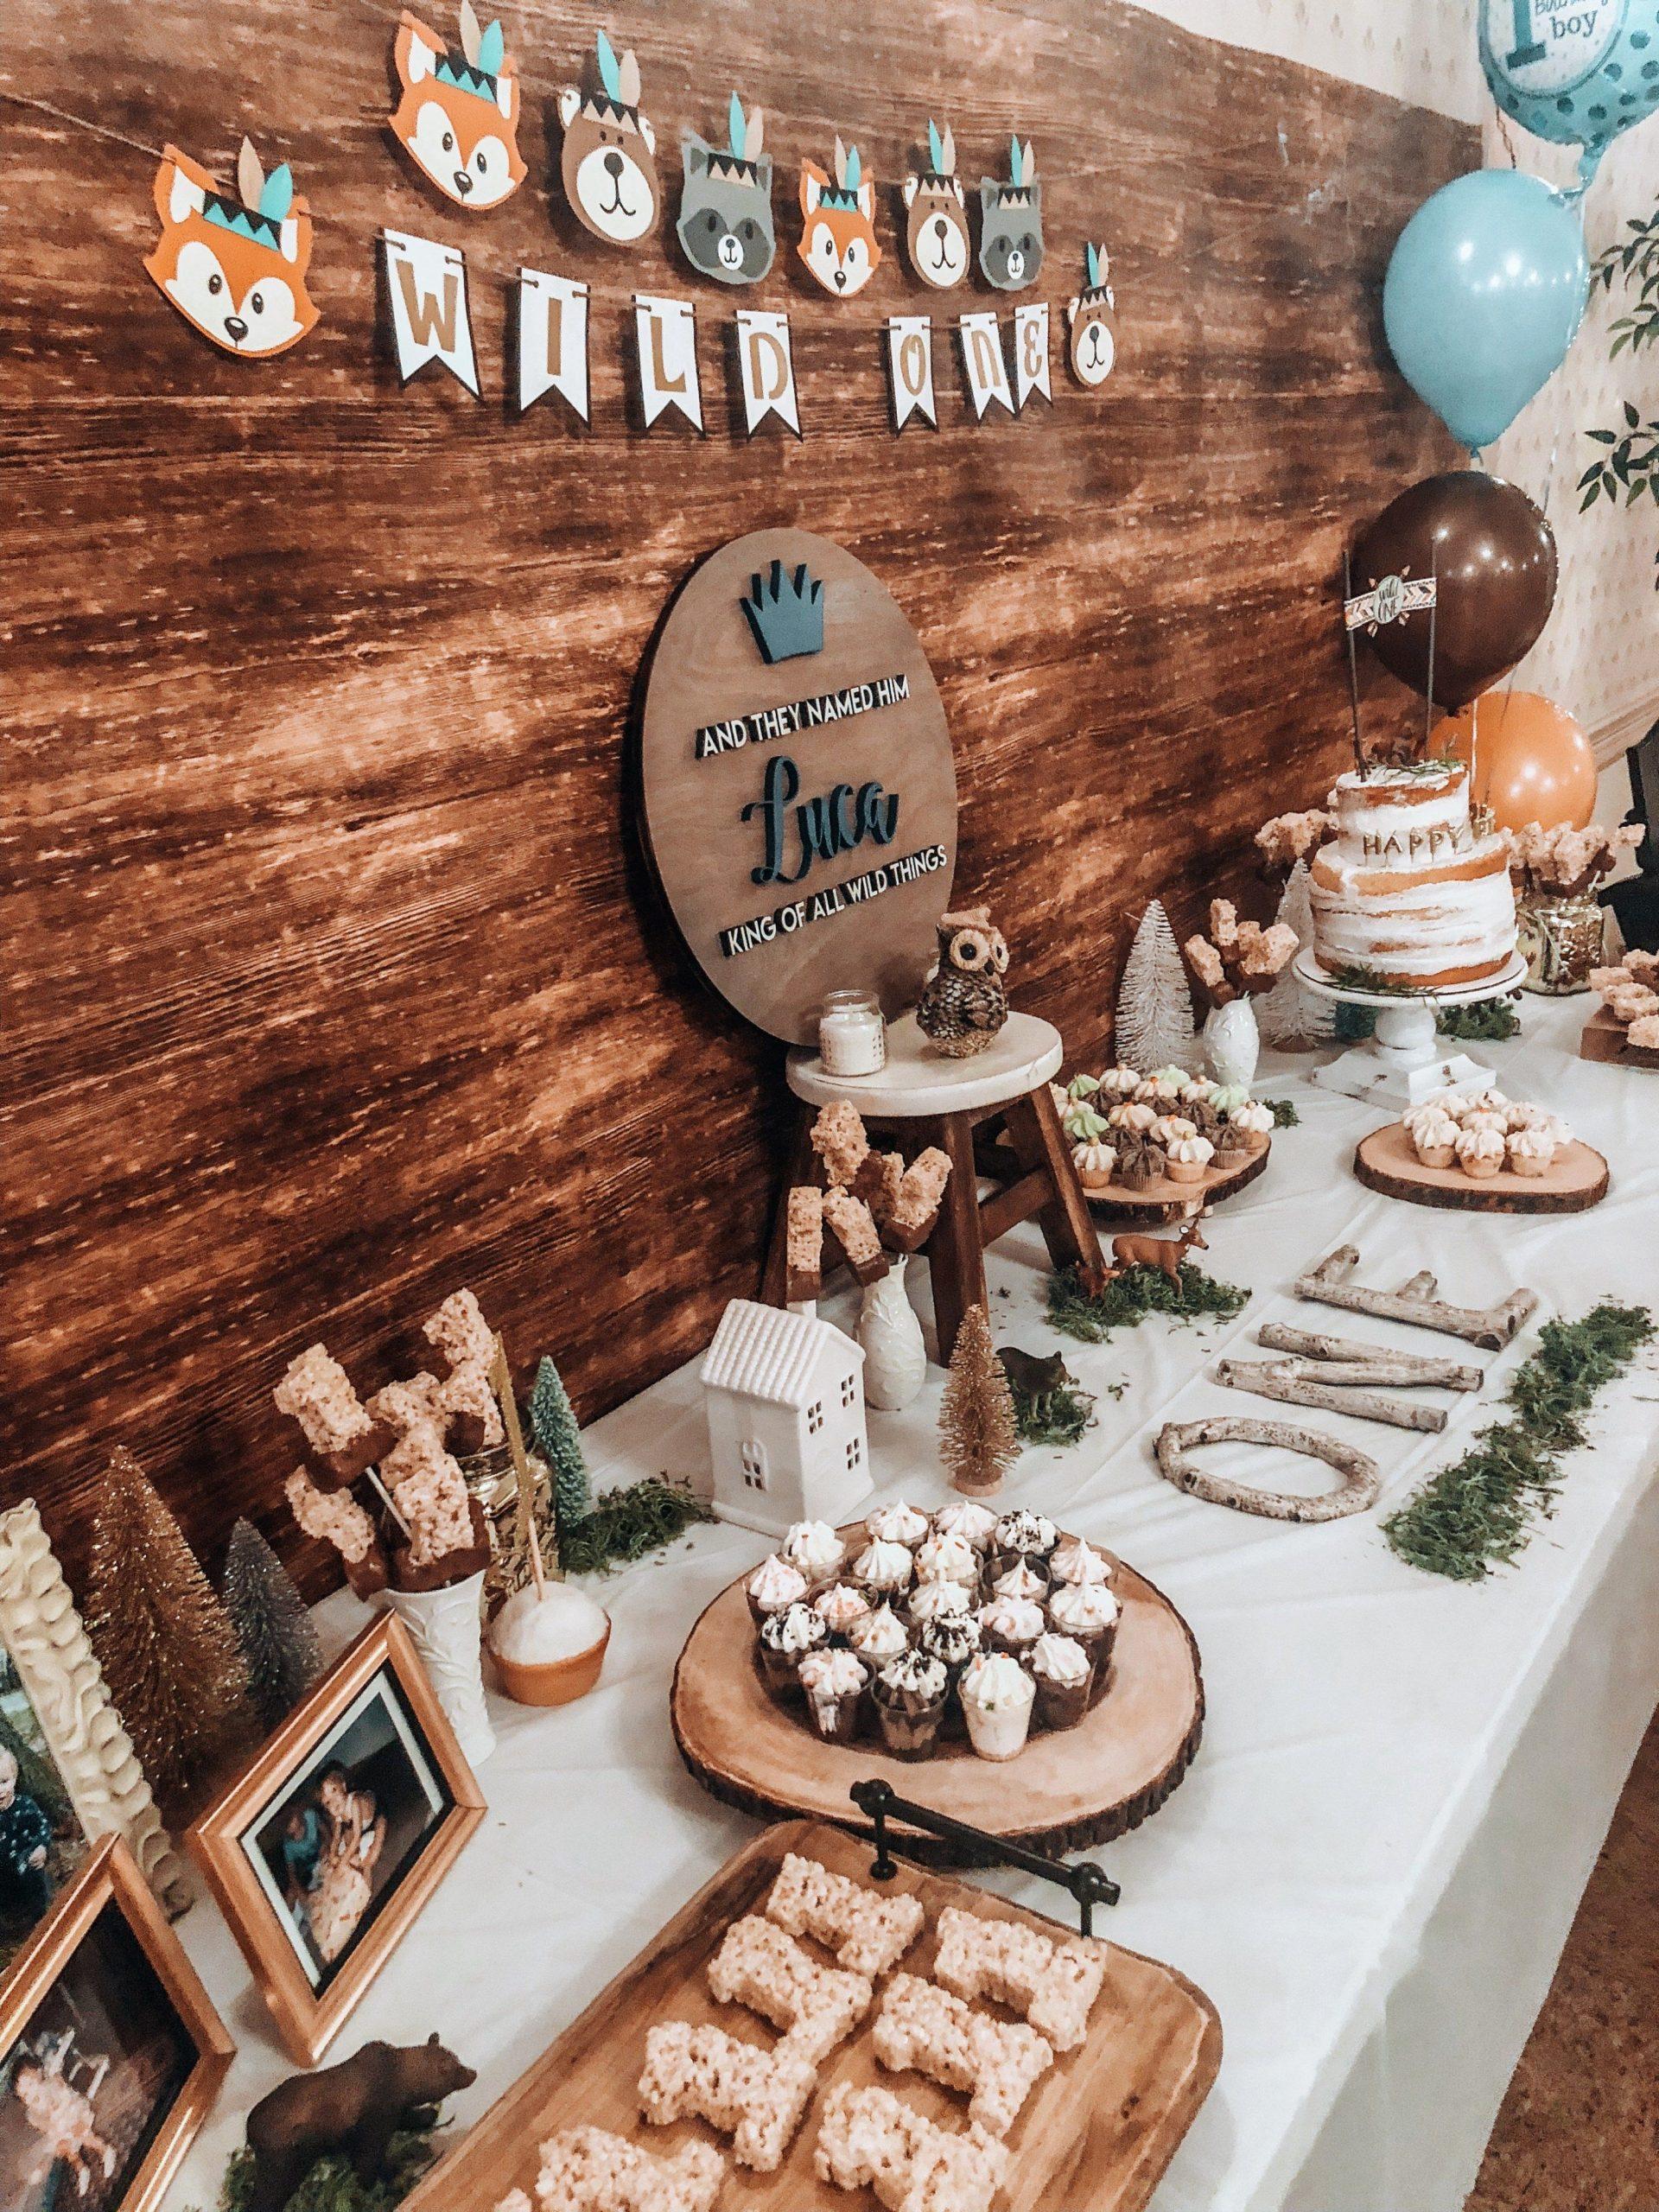 One Year Old Birthday Decoration Ideas Lovely Wild E First Birthday Wild & Wanderlust Blog with